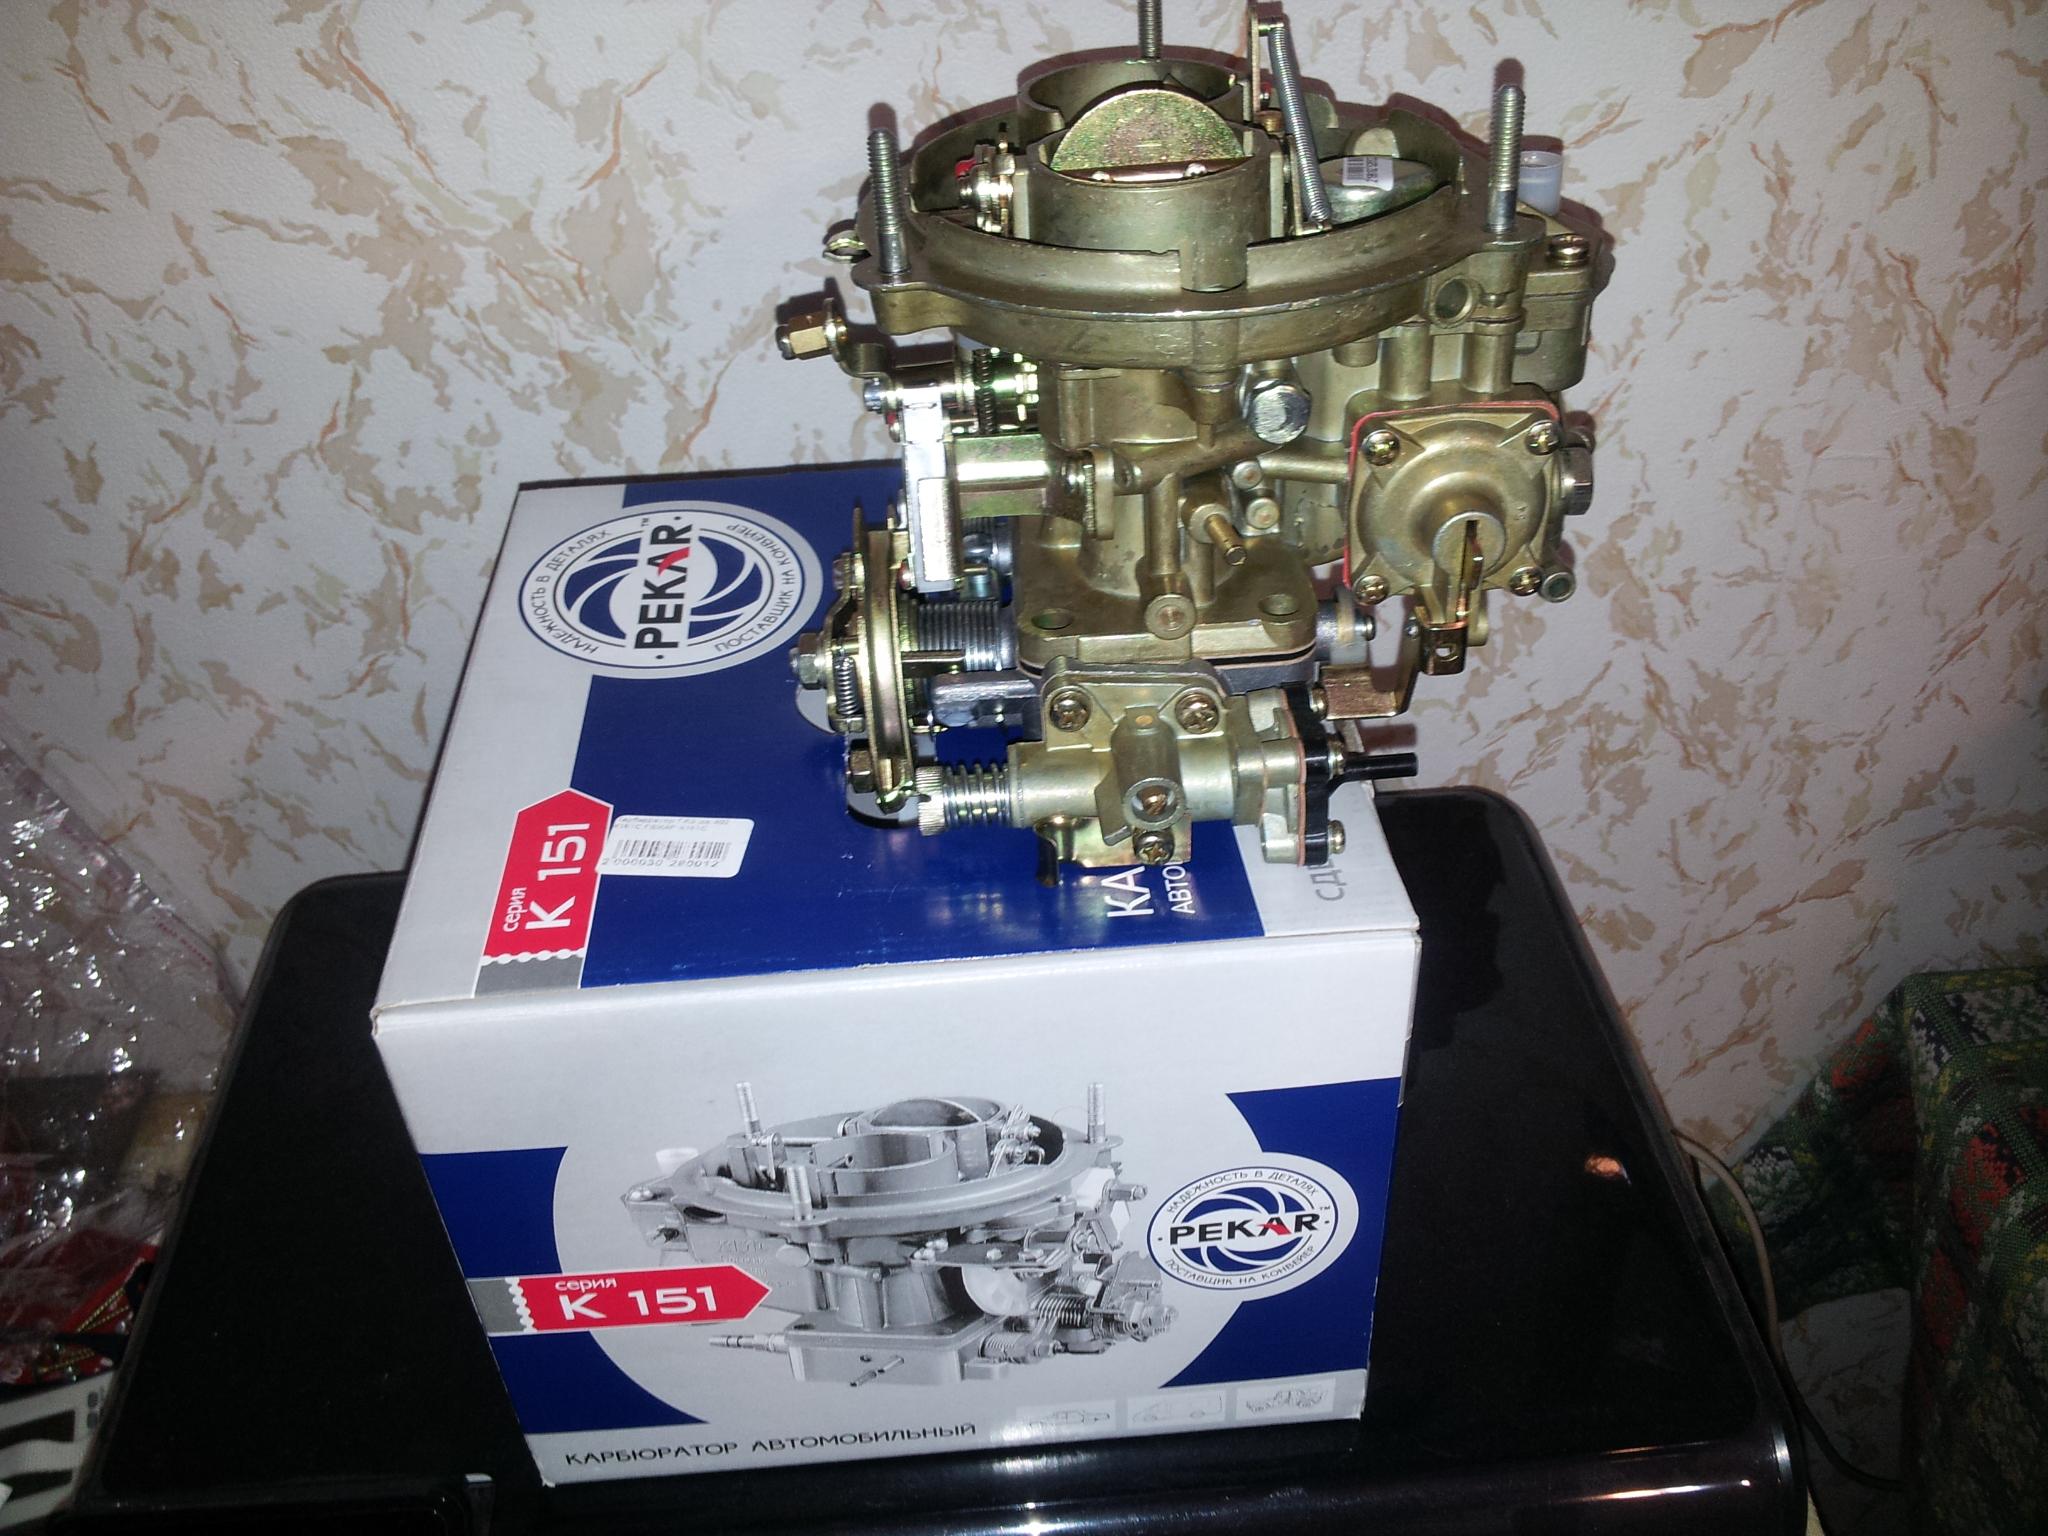 Russian Life: This is a Carburetor from a 1999 310221 Volga Gaz Wagon…